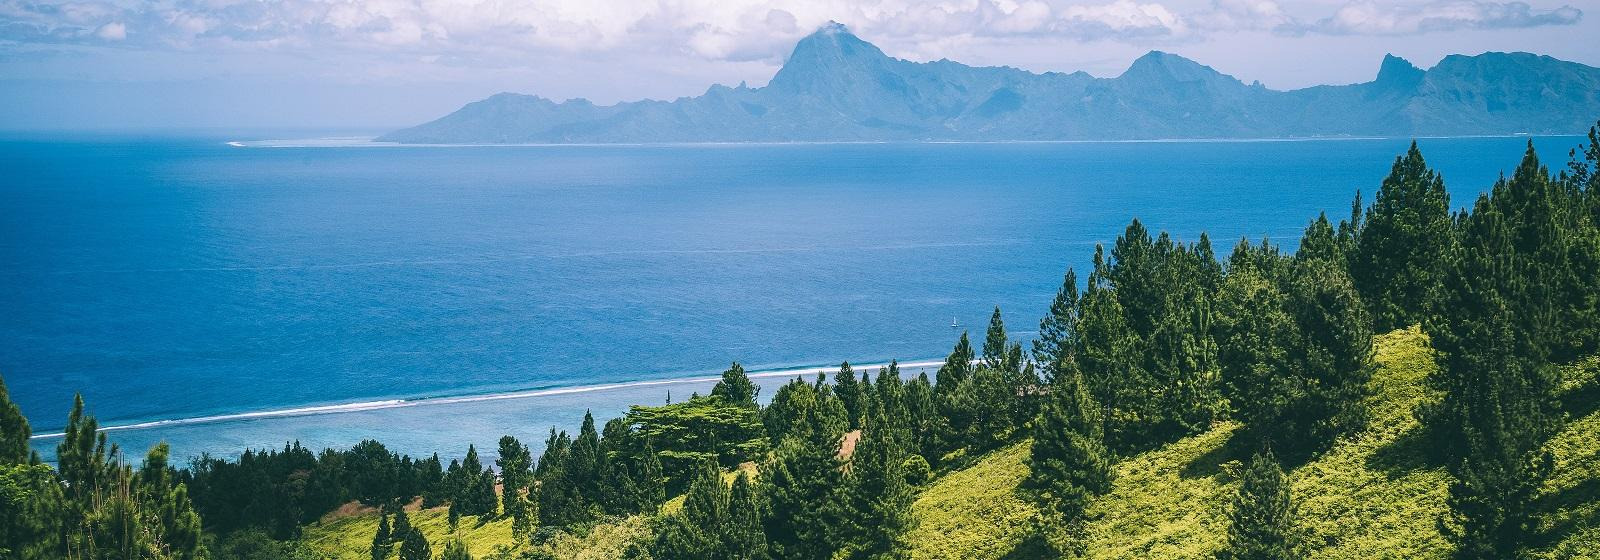 Things to do in Papeete, Tahiti